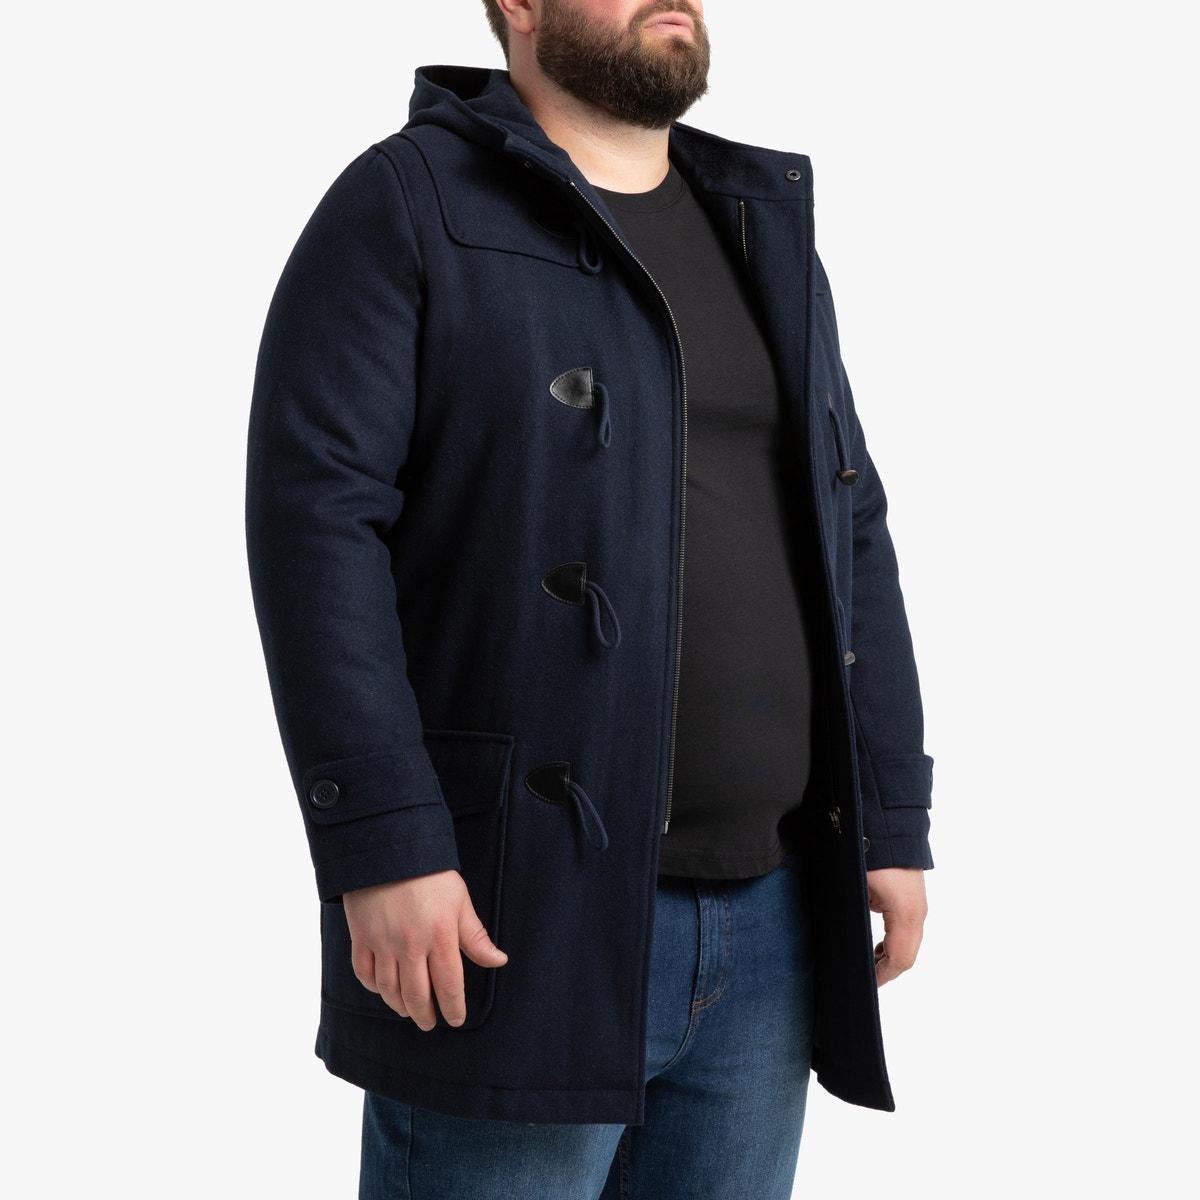 8d8e7c701f3 Παλτό καμηλό με κουκούλα, ΑΝΔΡΑΣ | ΡΟΥΧΑ | ΠΑΛΤΟ - ΜΠΟΥΦΑΝ | ΠΑΛΤΟ